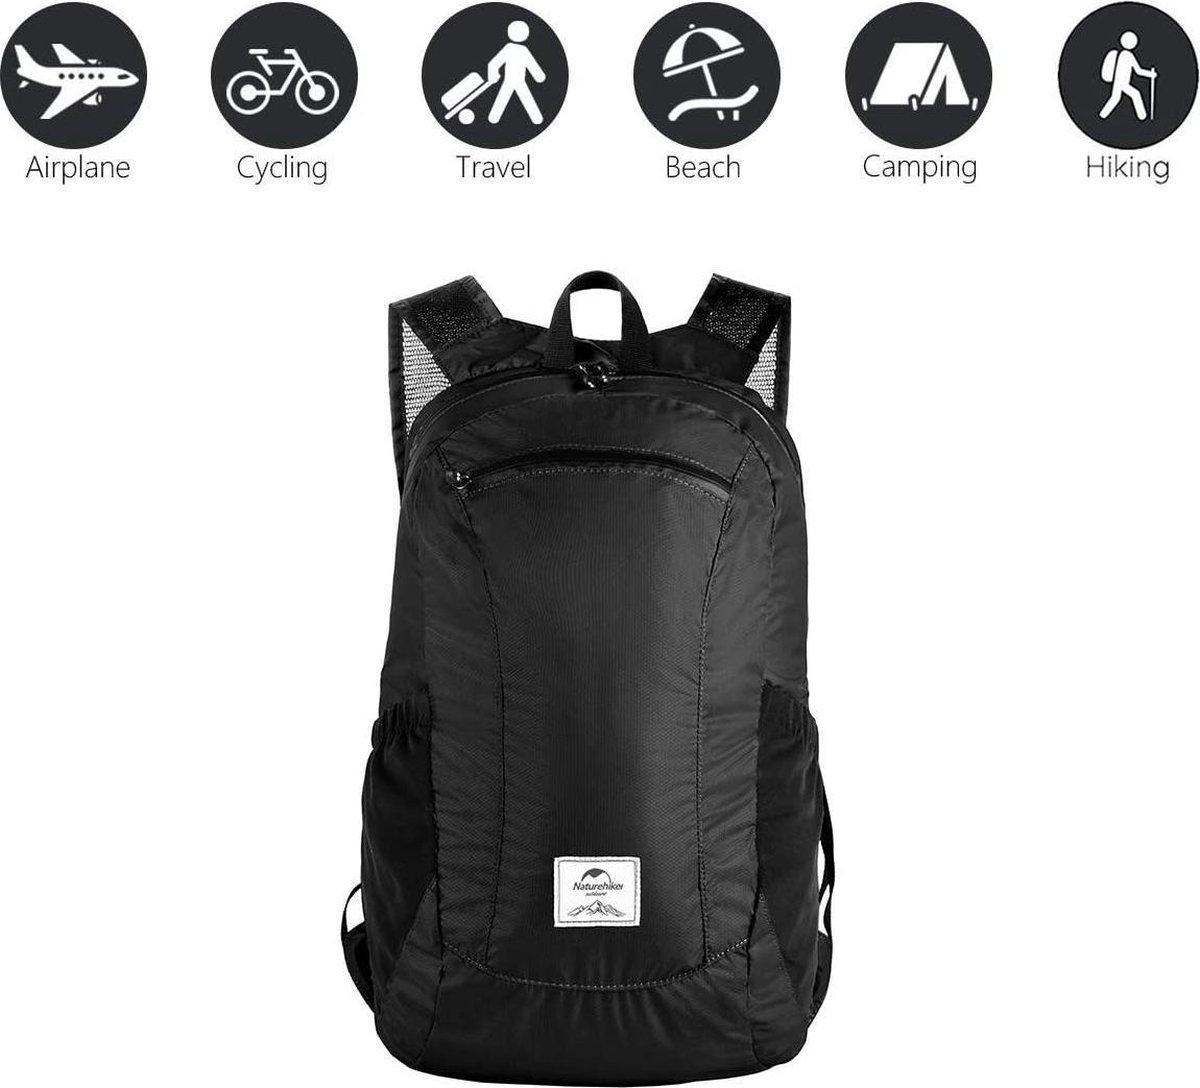 Opvouwbare Backpack / Daypack - Water Bestendig - Outdoor - Lichtgewicht - 18 Liter - Zwart